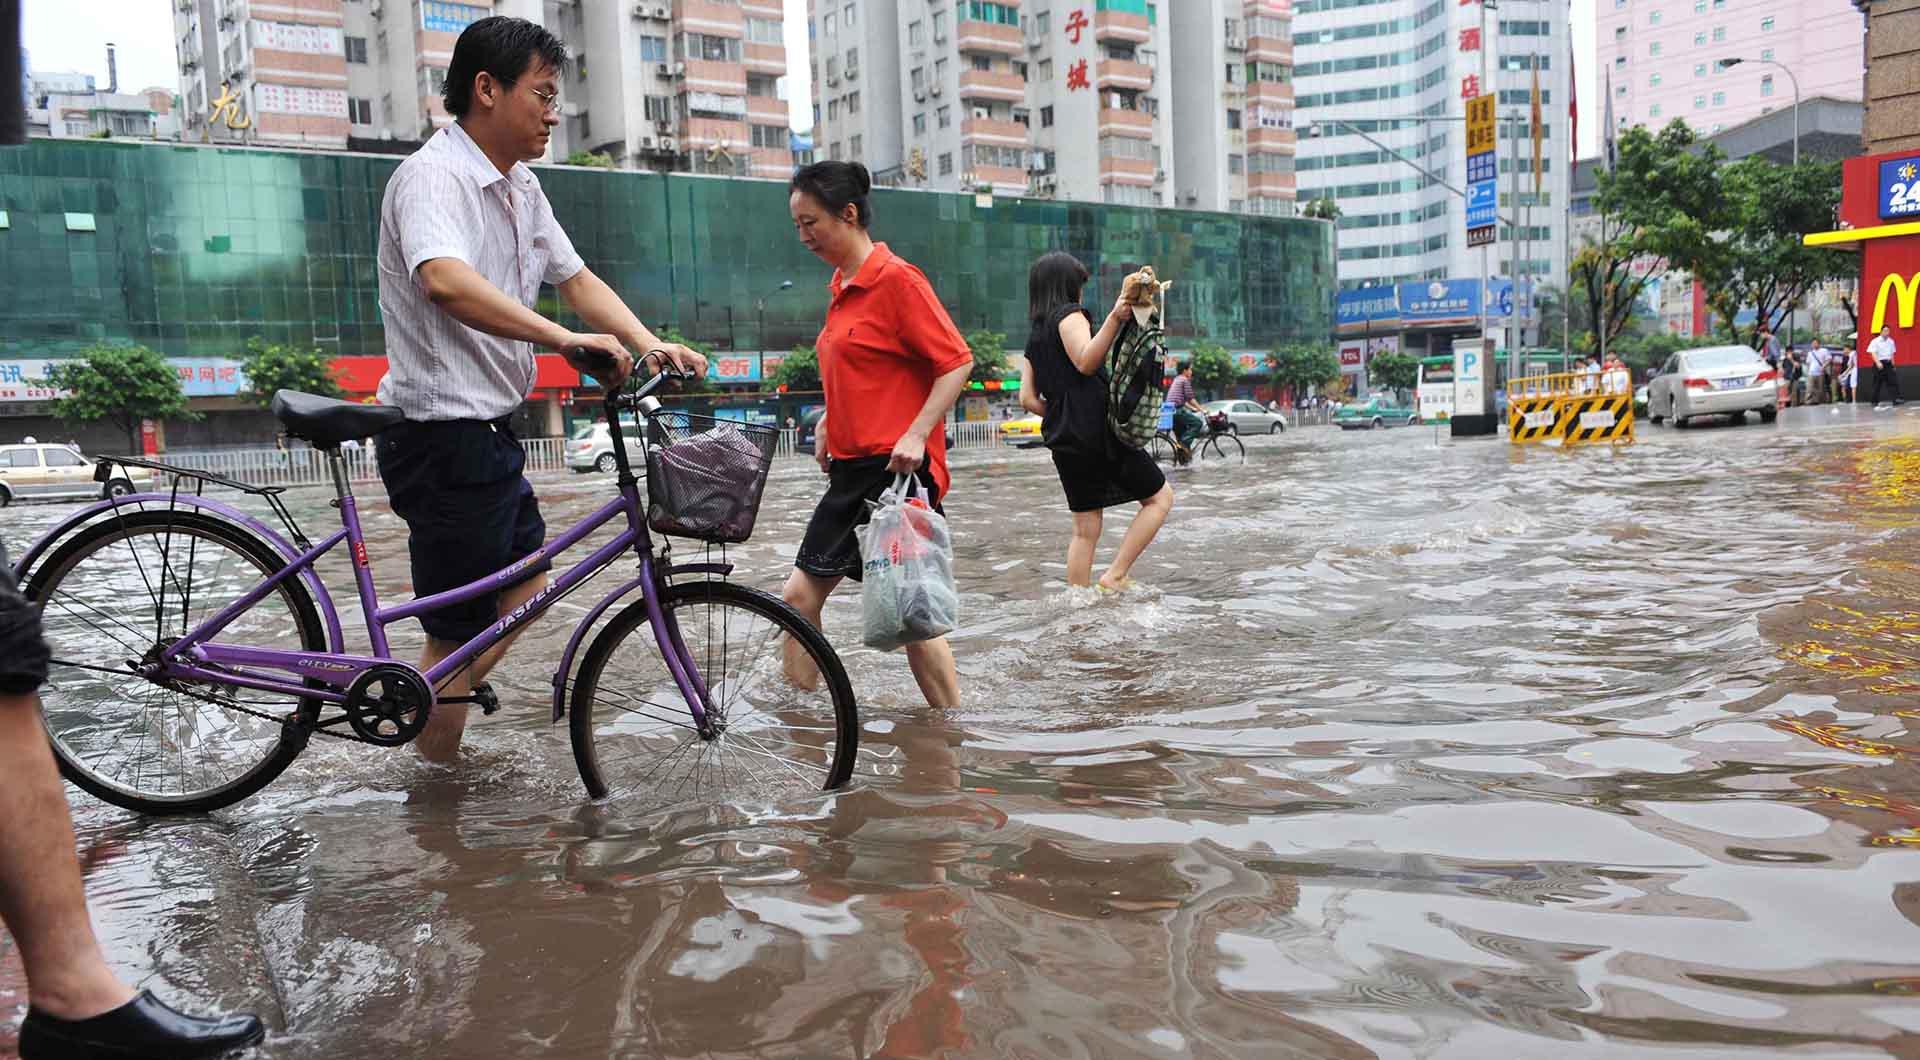 Guangzhou street flooding.jpg